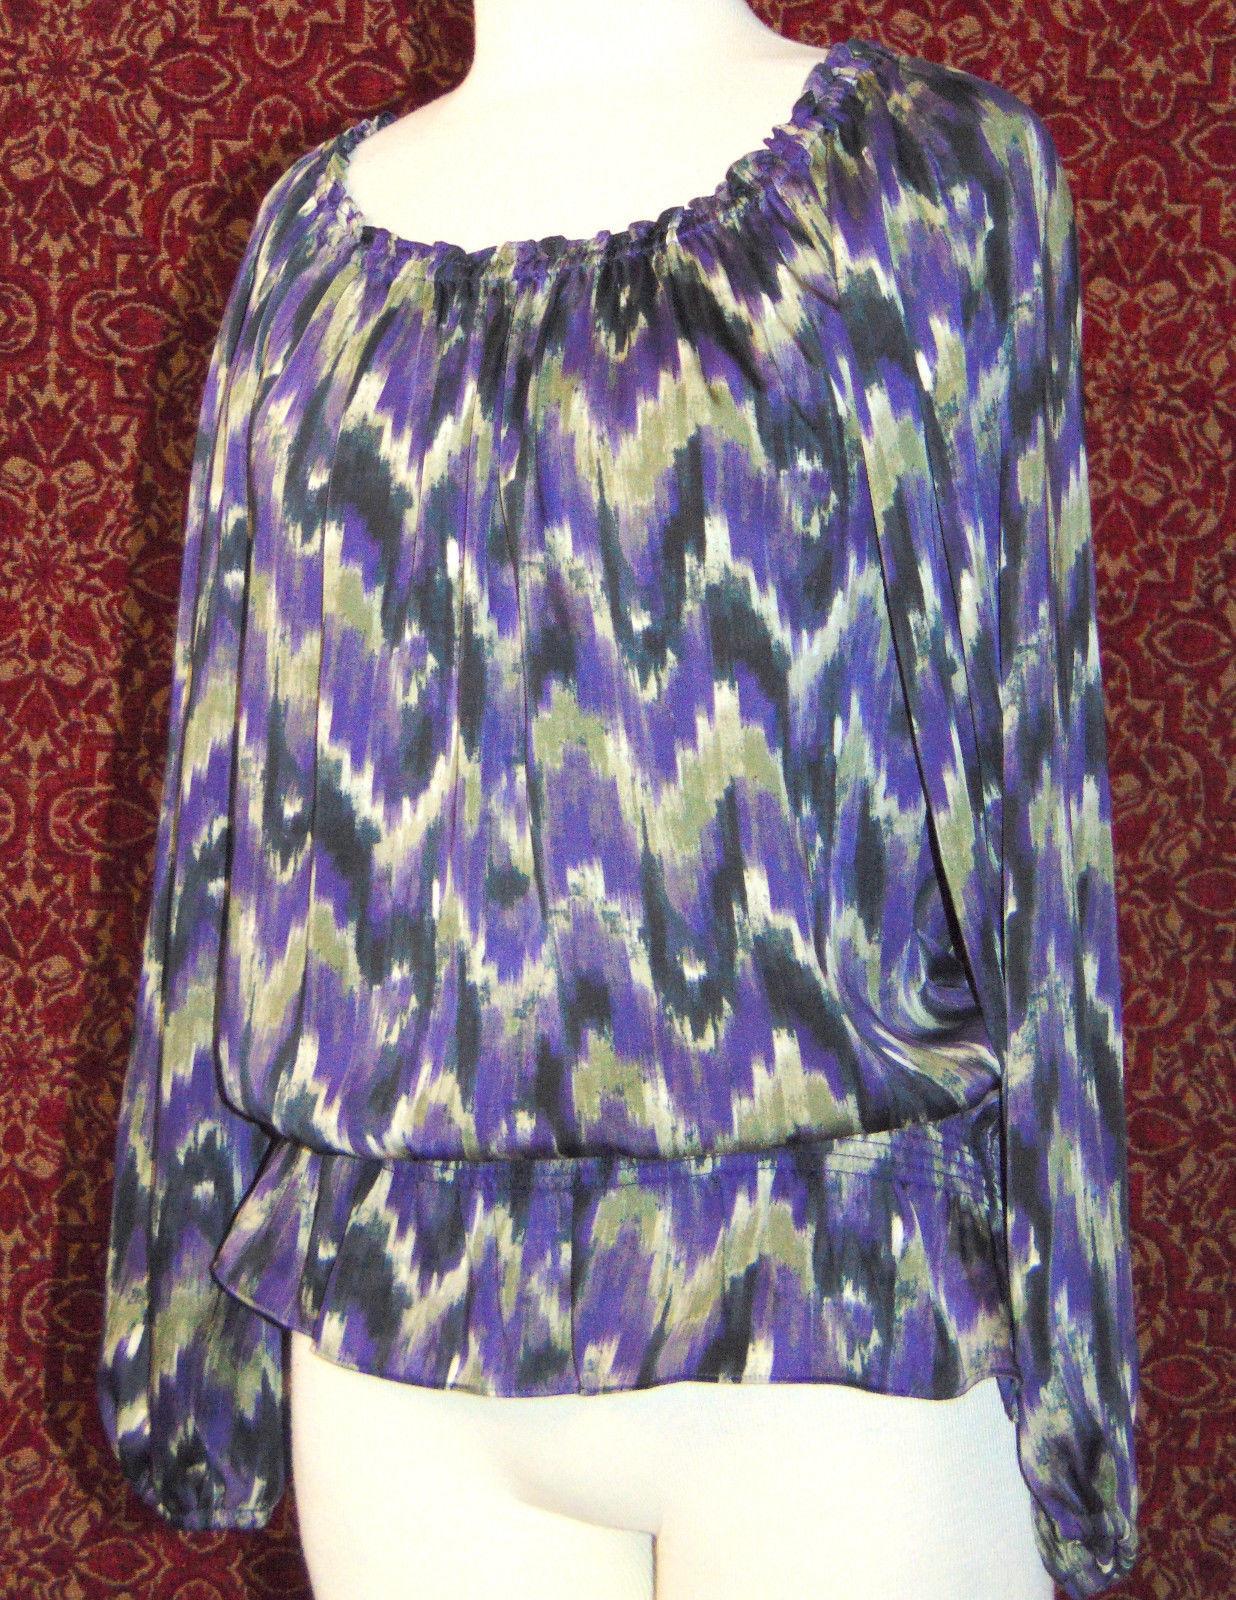 MICHAEL KORS purple polyester long sleeve blouse M (T47-01C8G)